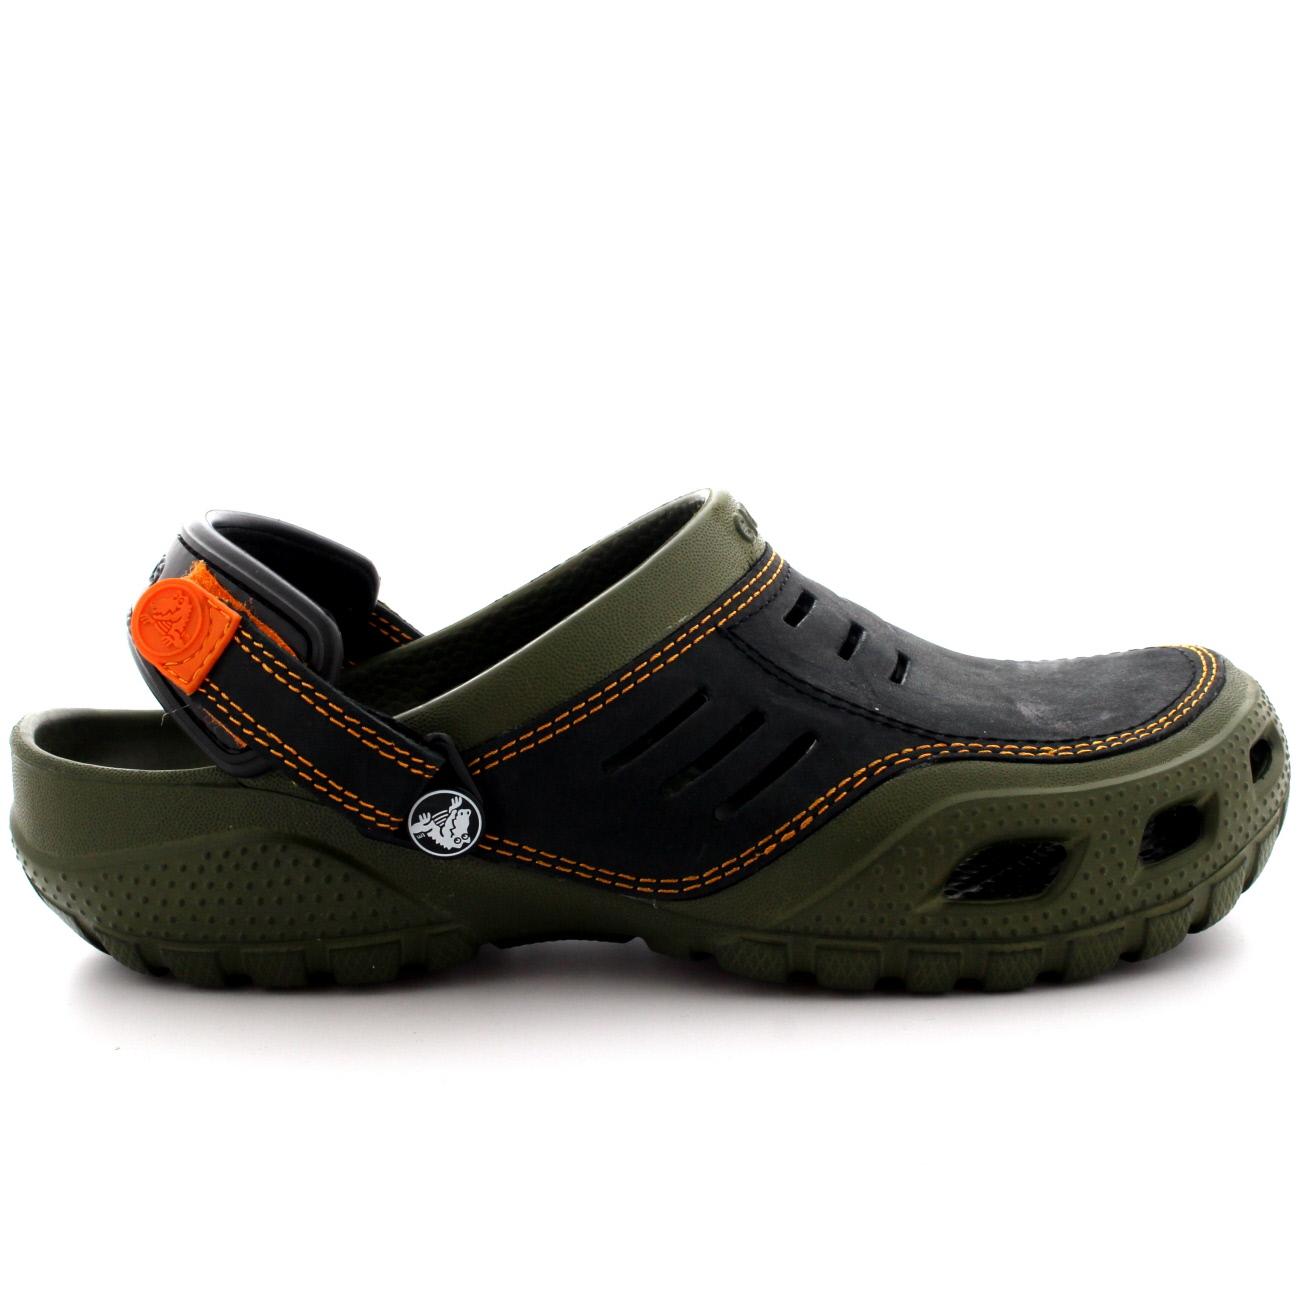 Mens Crocs Shoes Uk